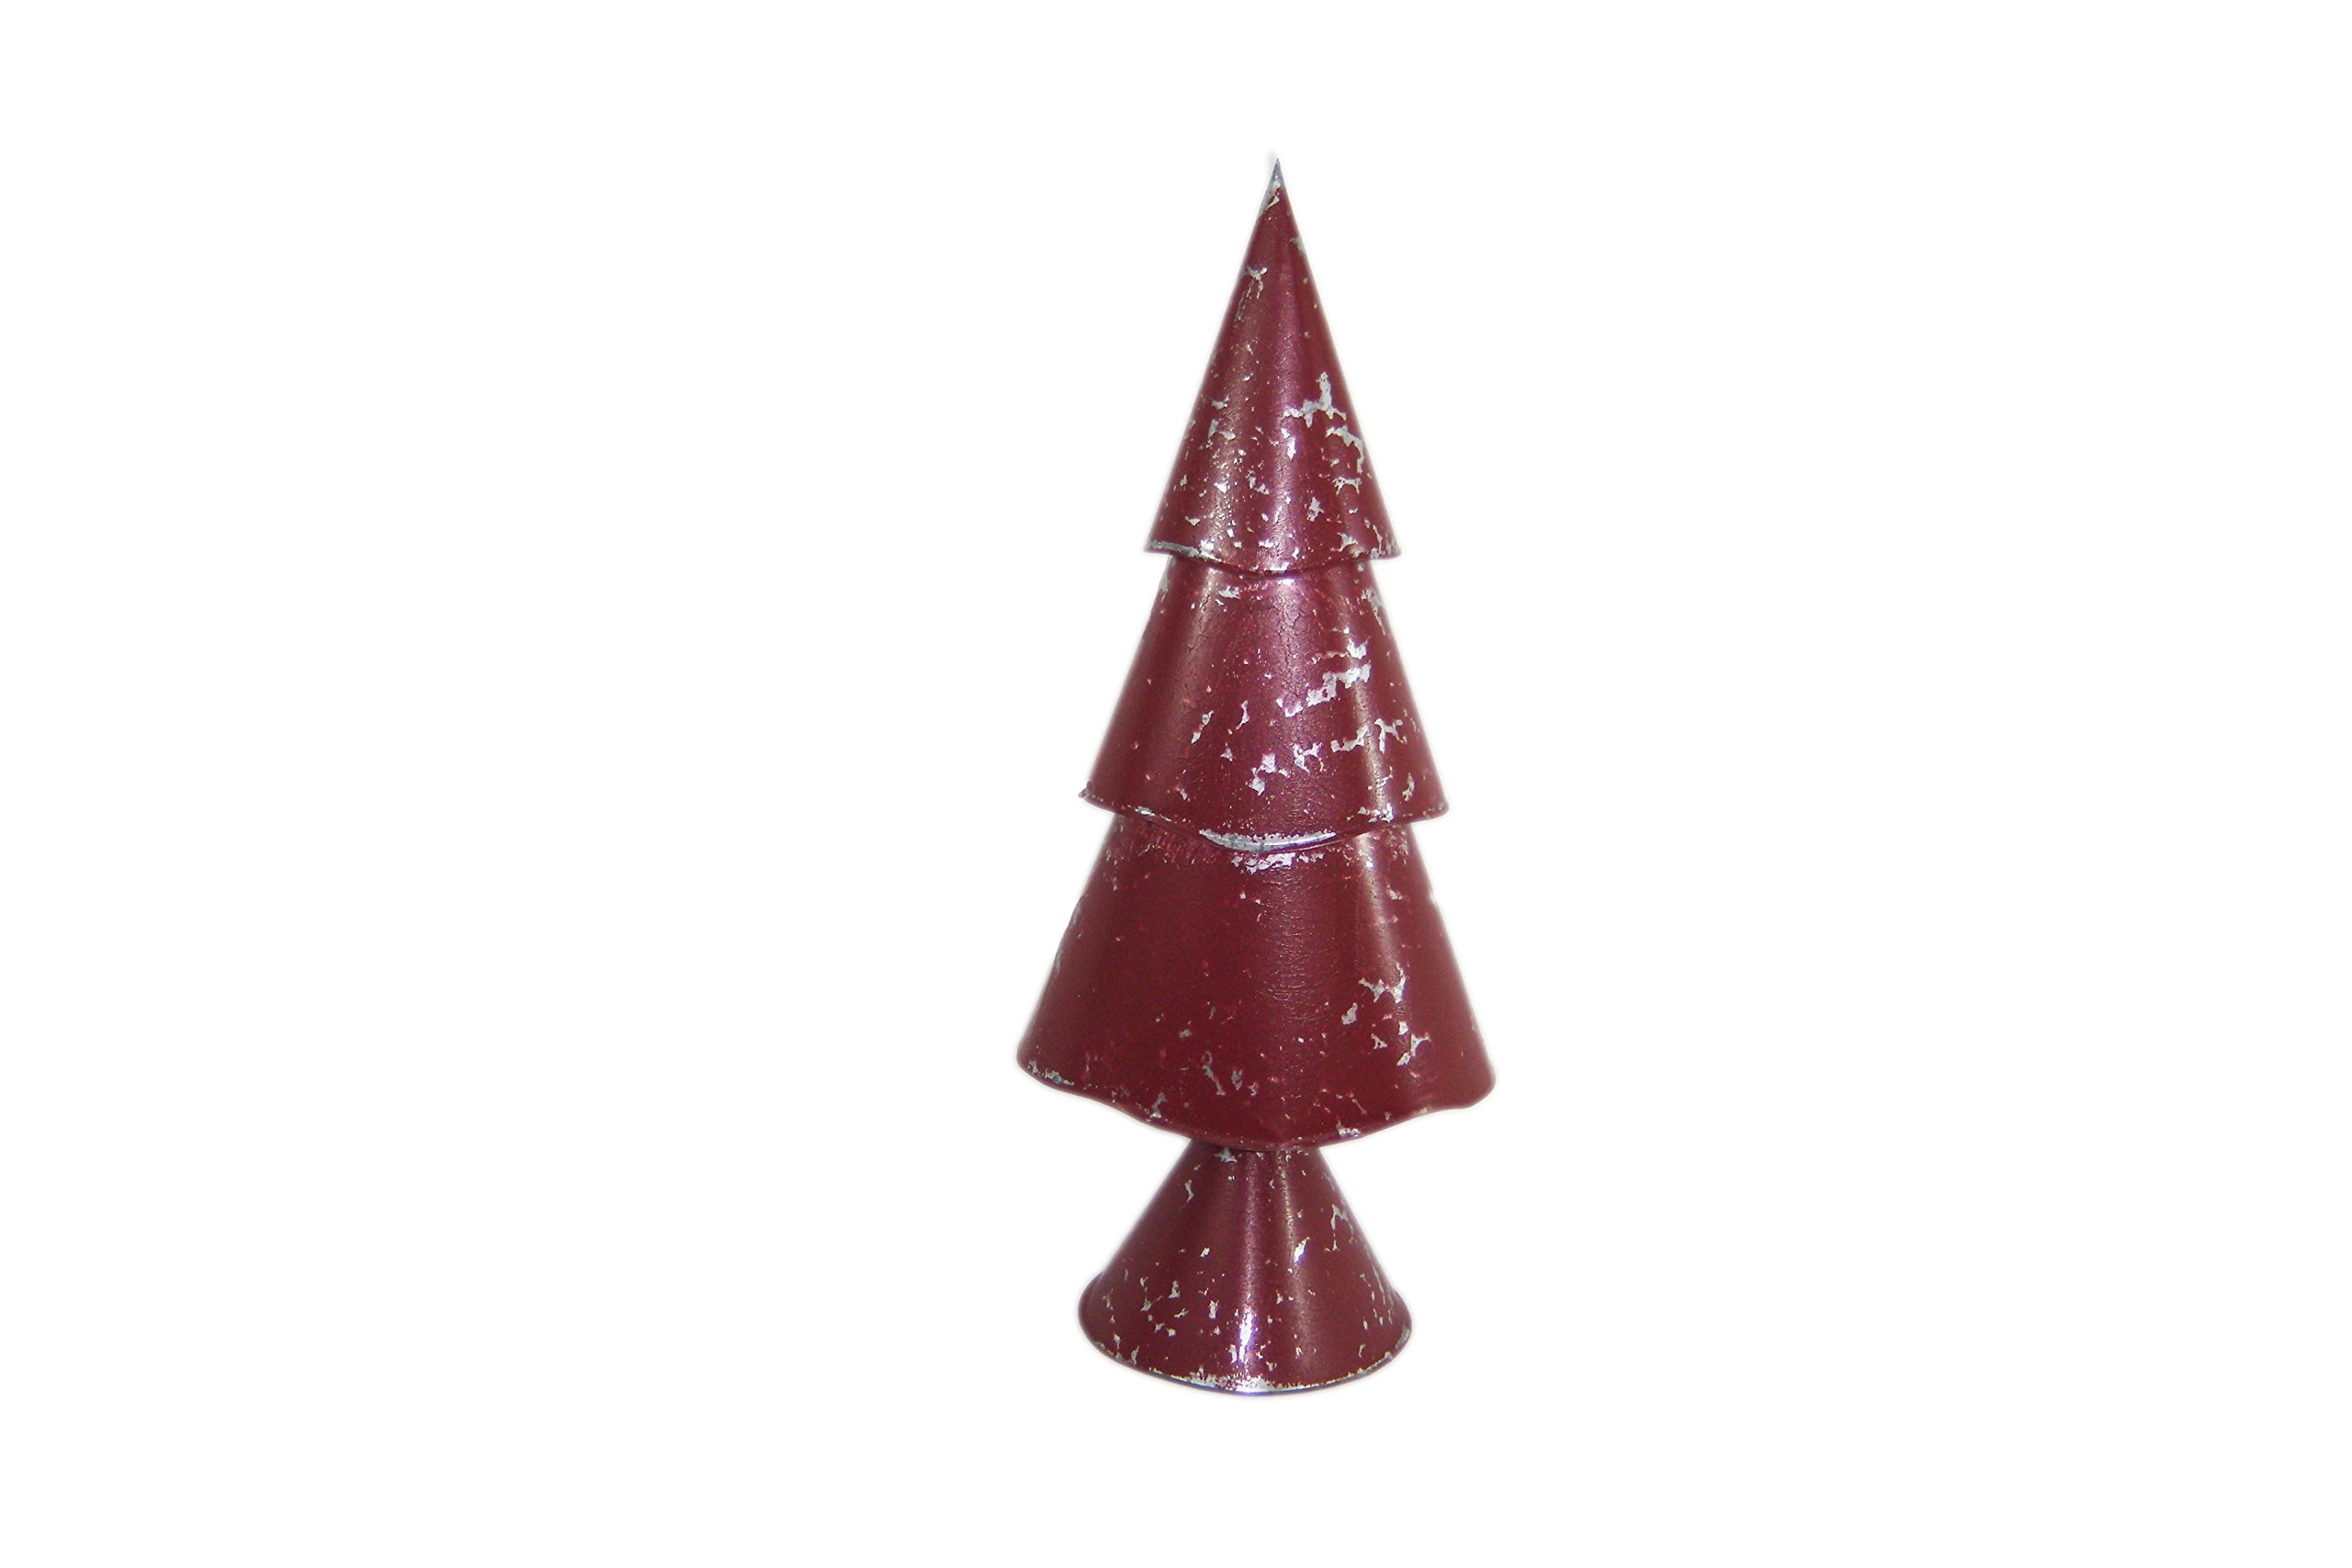 Medium Red Three-Tier Christmas Tree